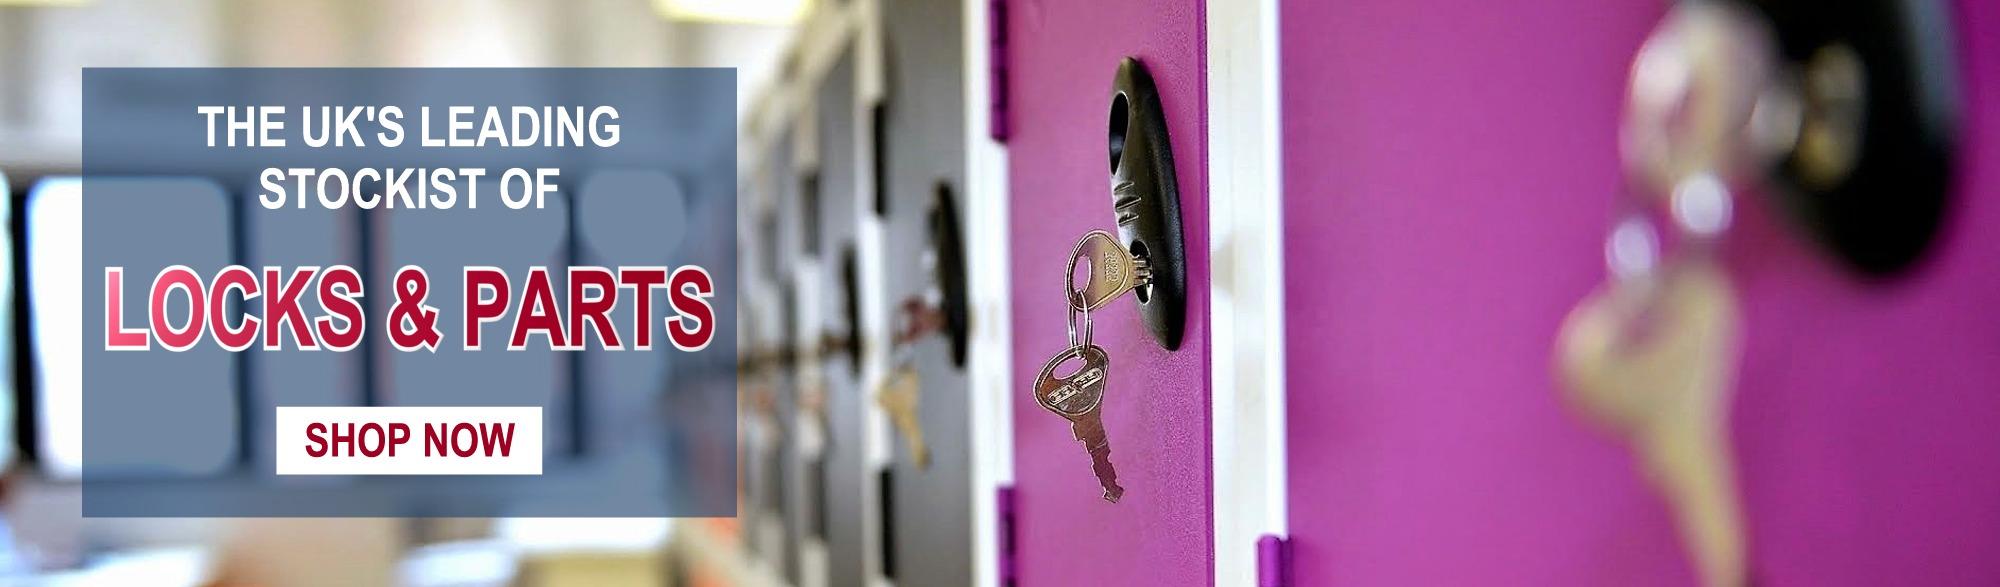 replacement locker parts locks keys card holders escutcheons padlocks doors stands sloping tops coin combination latch hasp